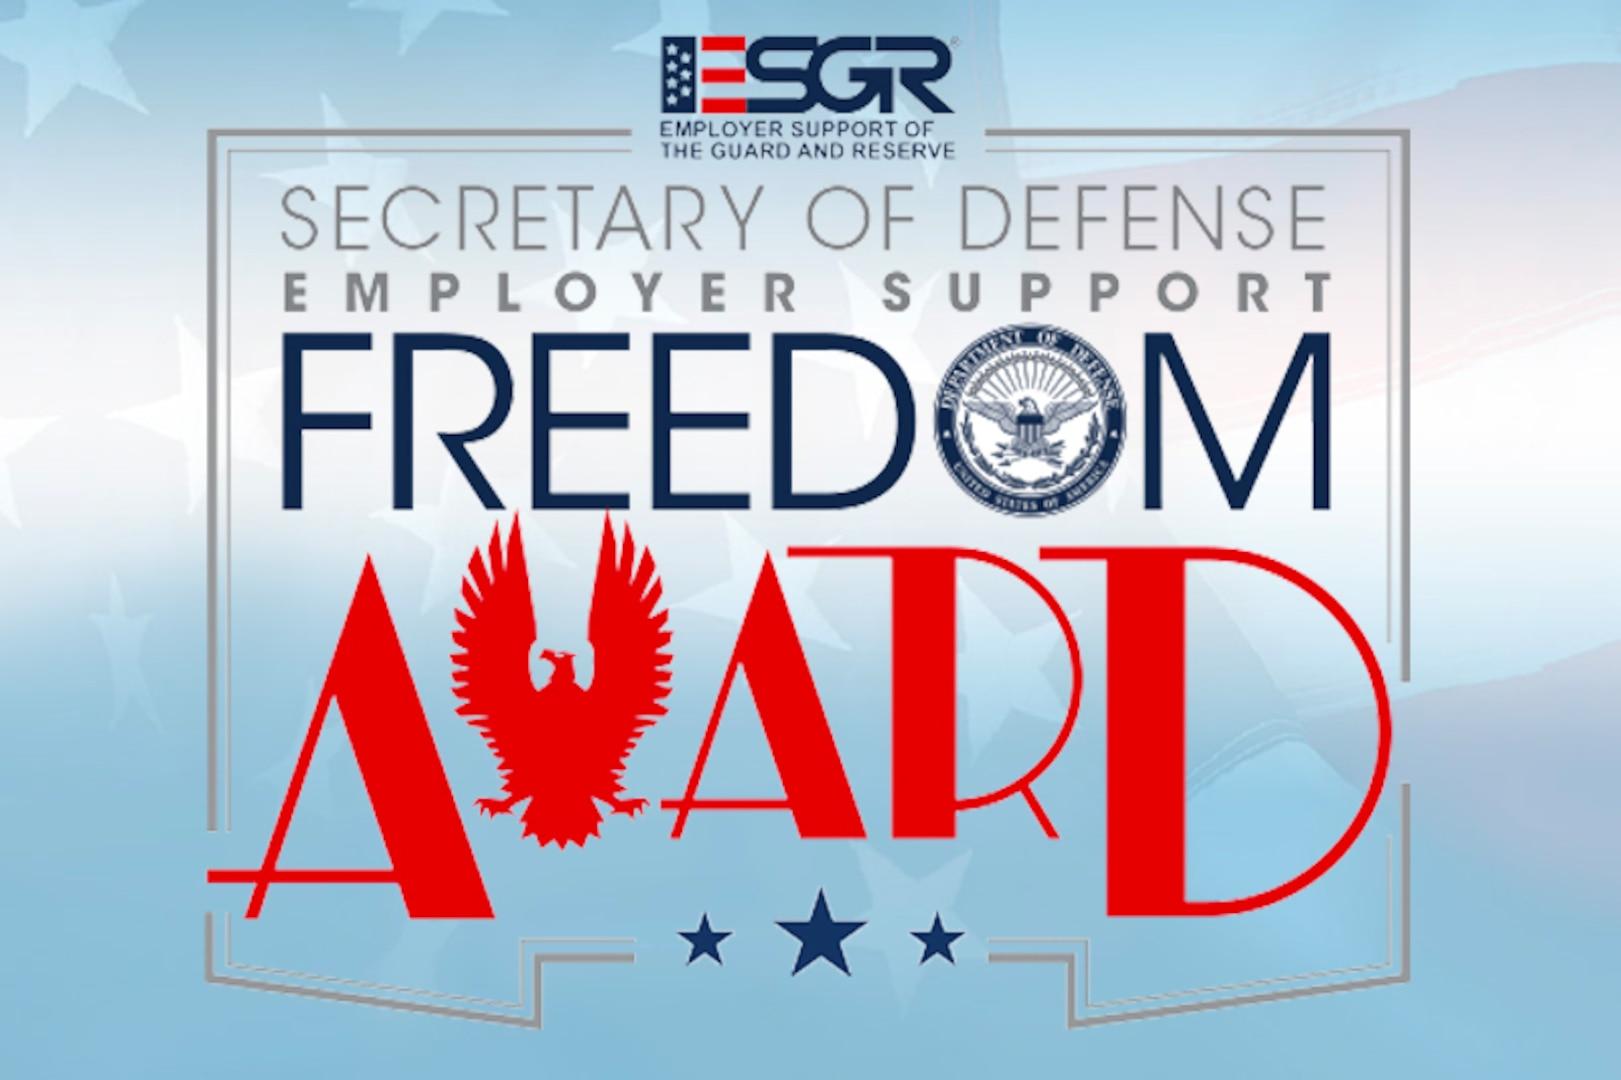 Employer Support Freedom Award